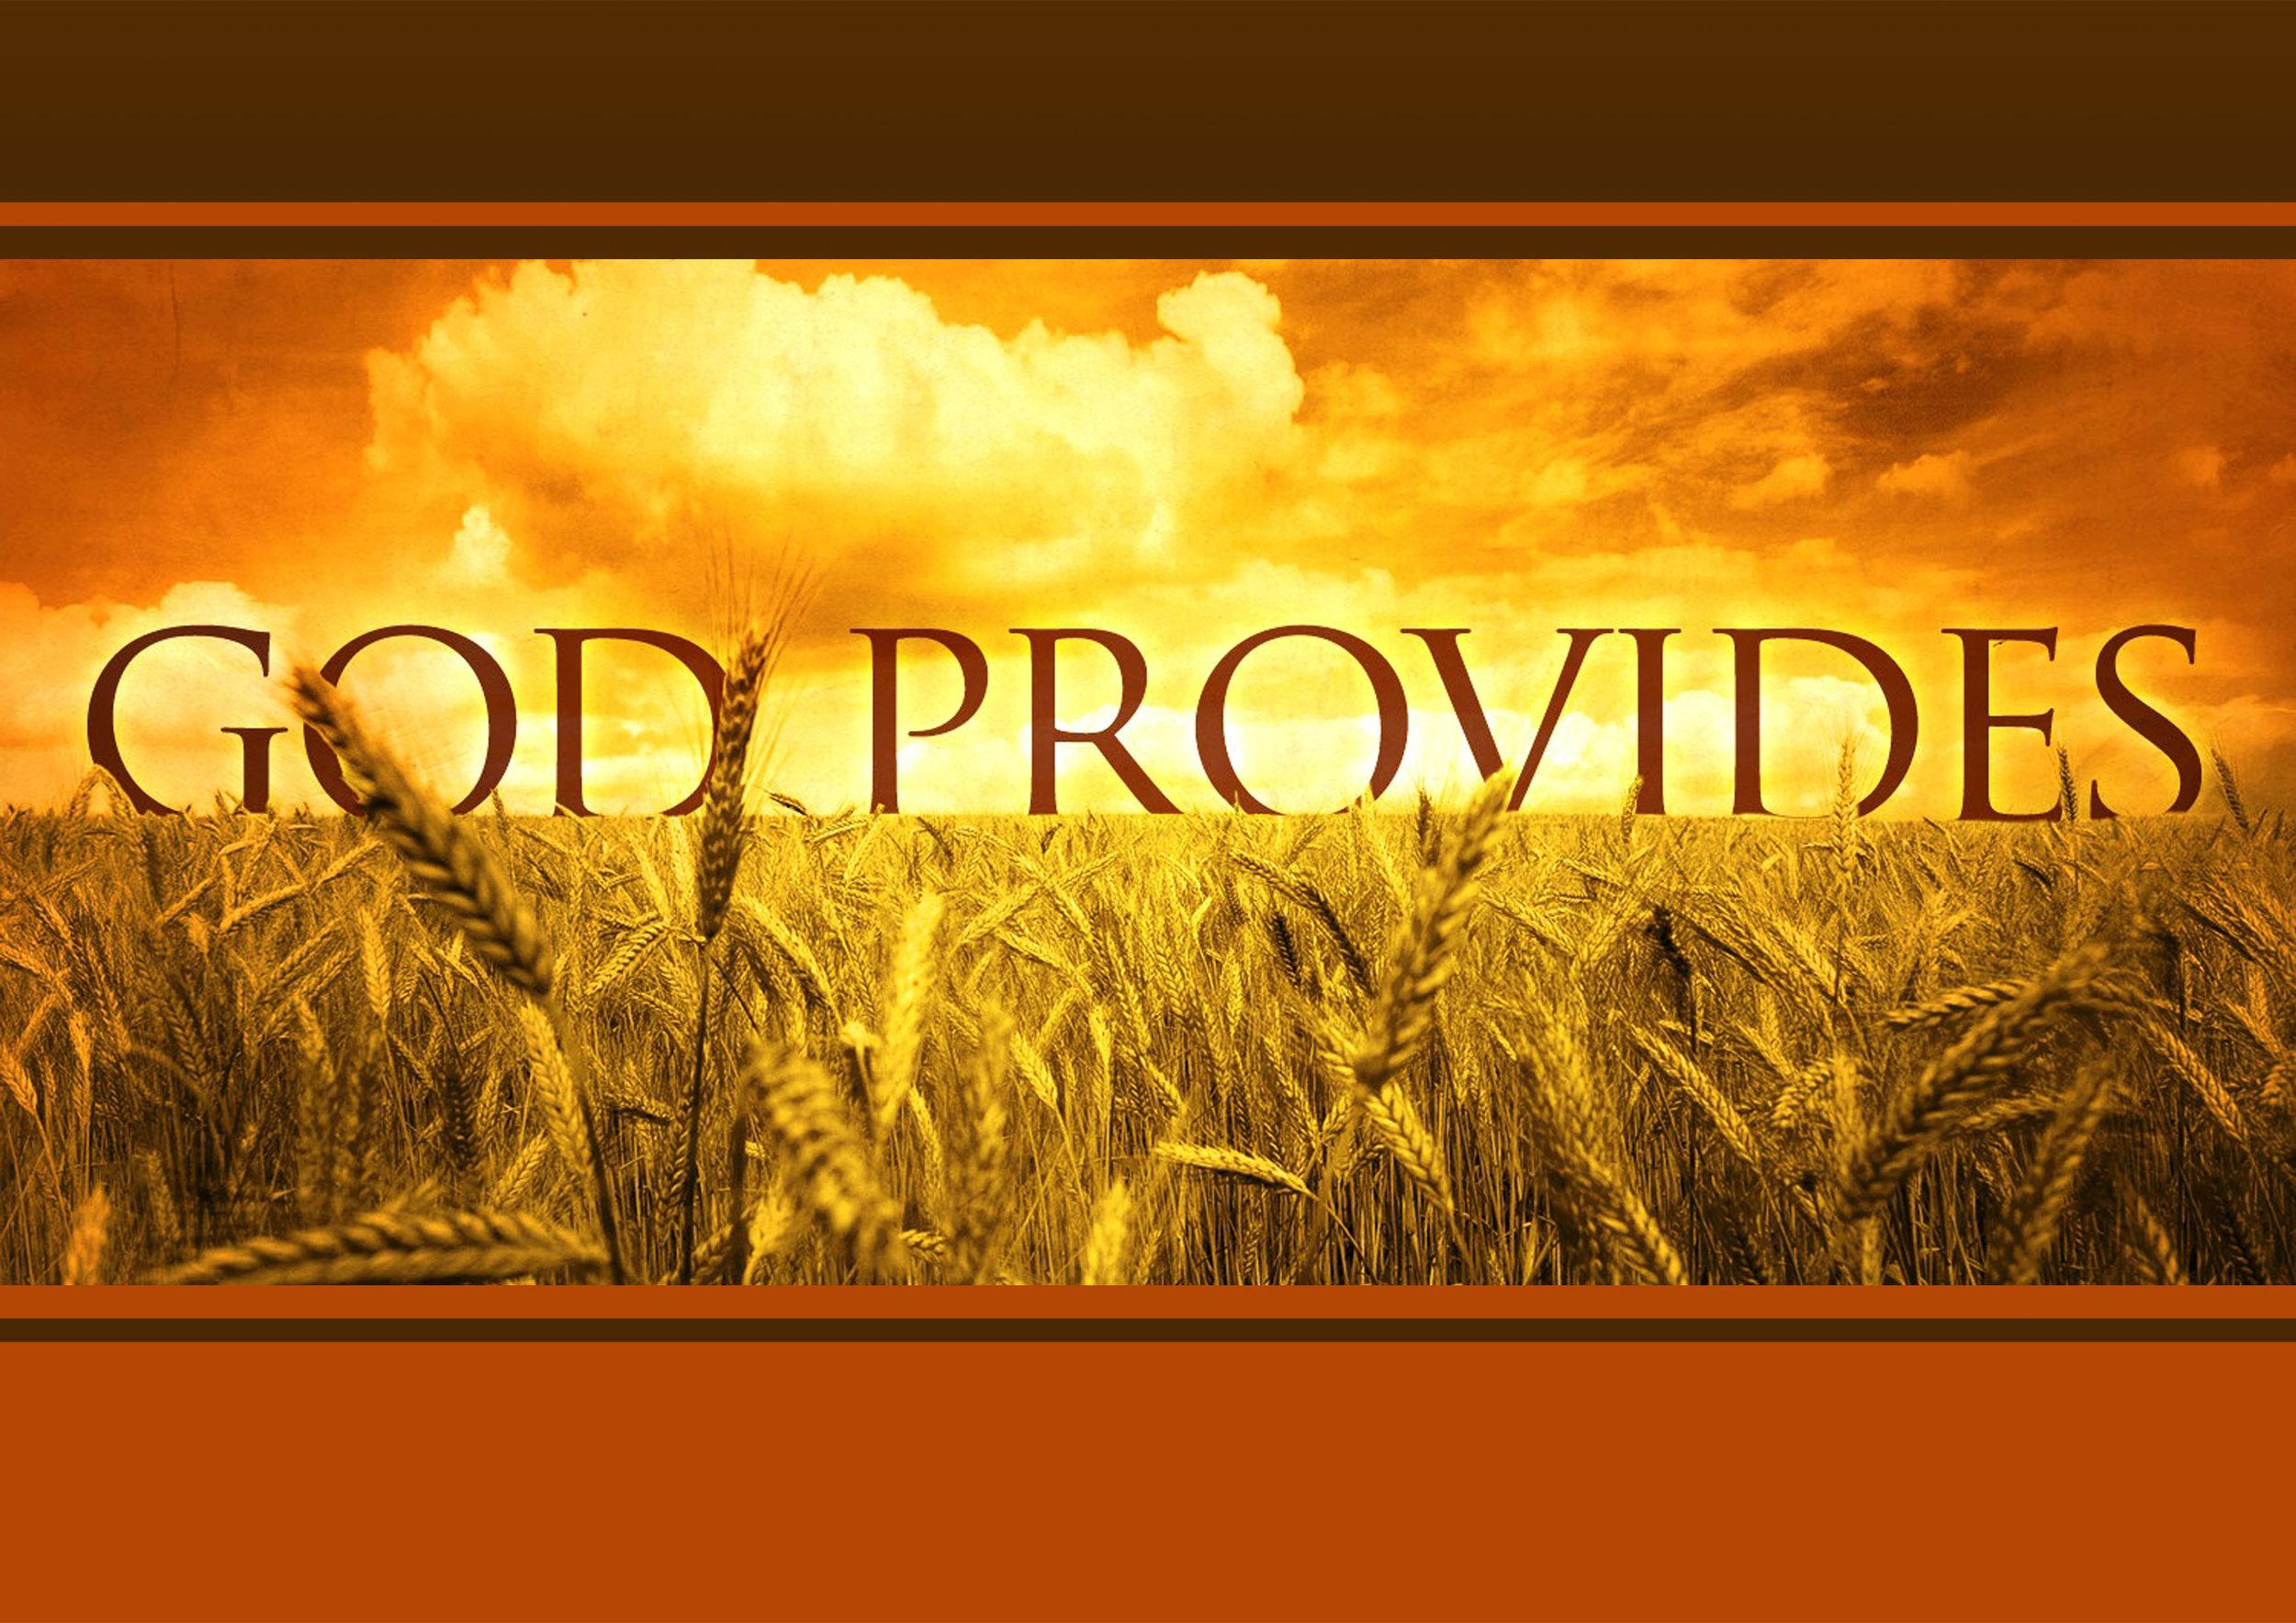 Abundant Living - This series revolves around God's providence.